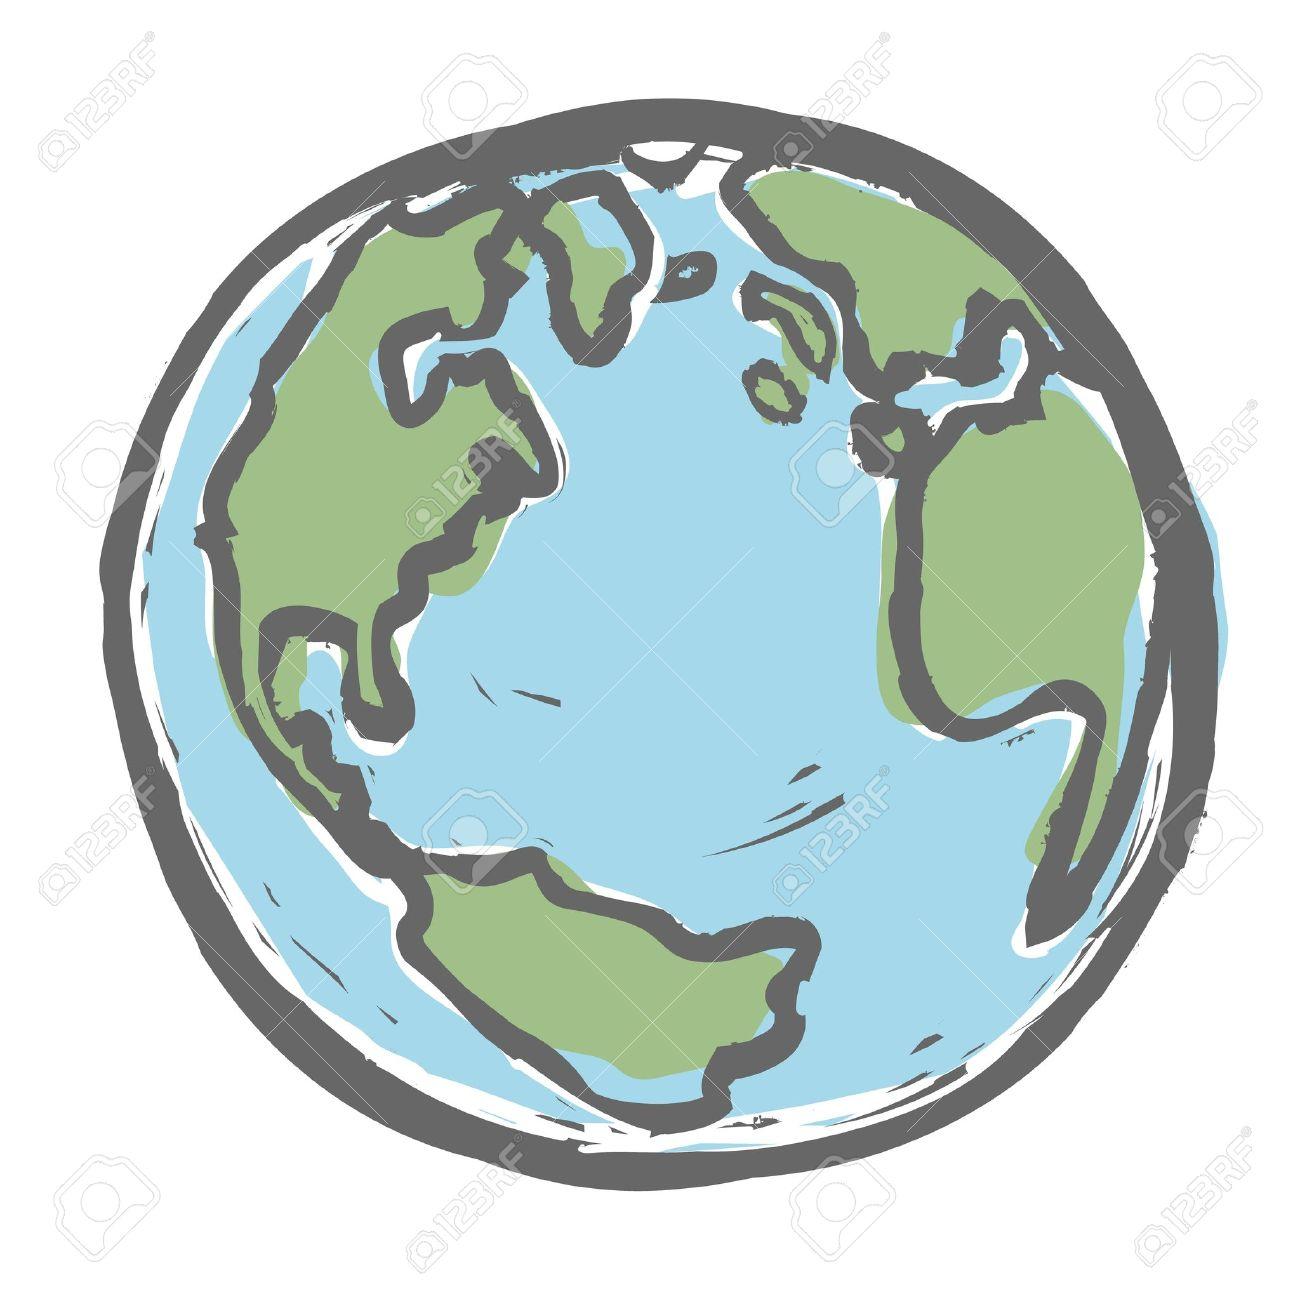 Hand drawn earth. - 18216071